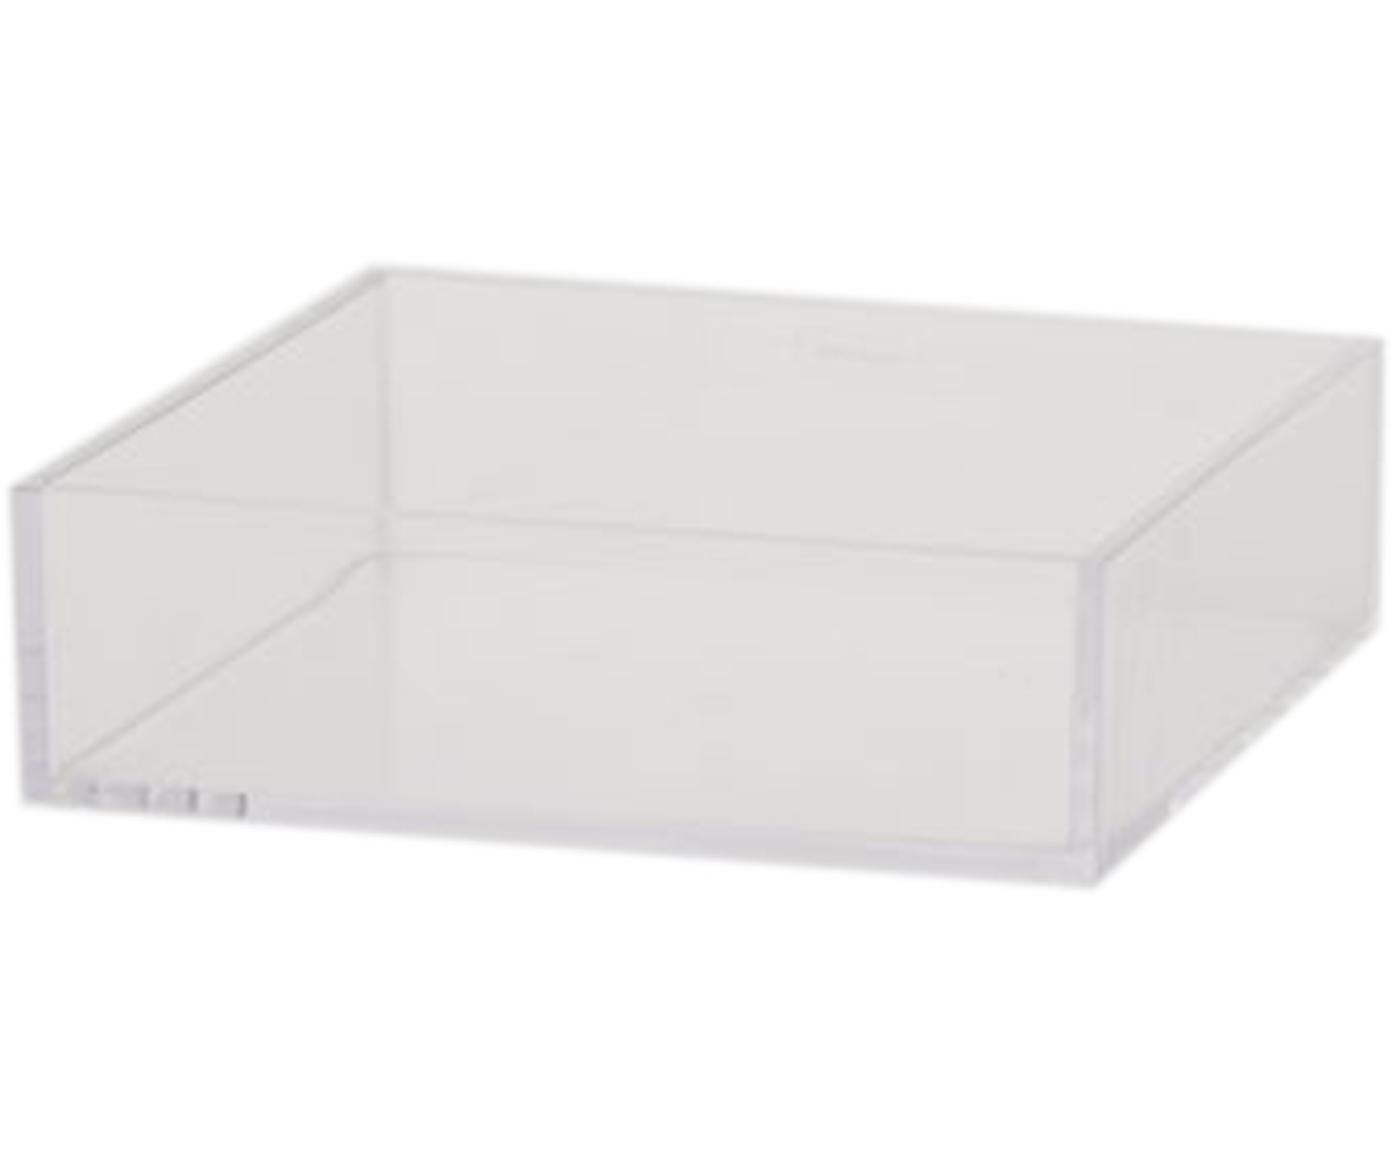 Bandeja Clear, Acrílico, Transparente, An 16 x L 16 cm